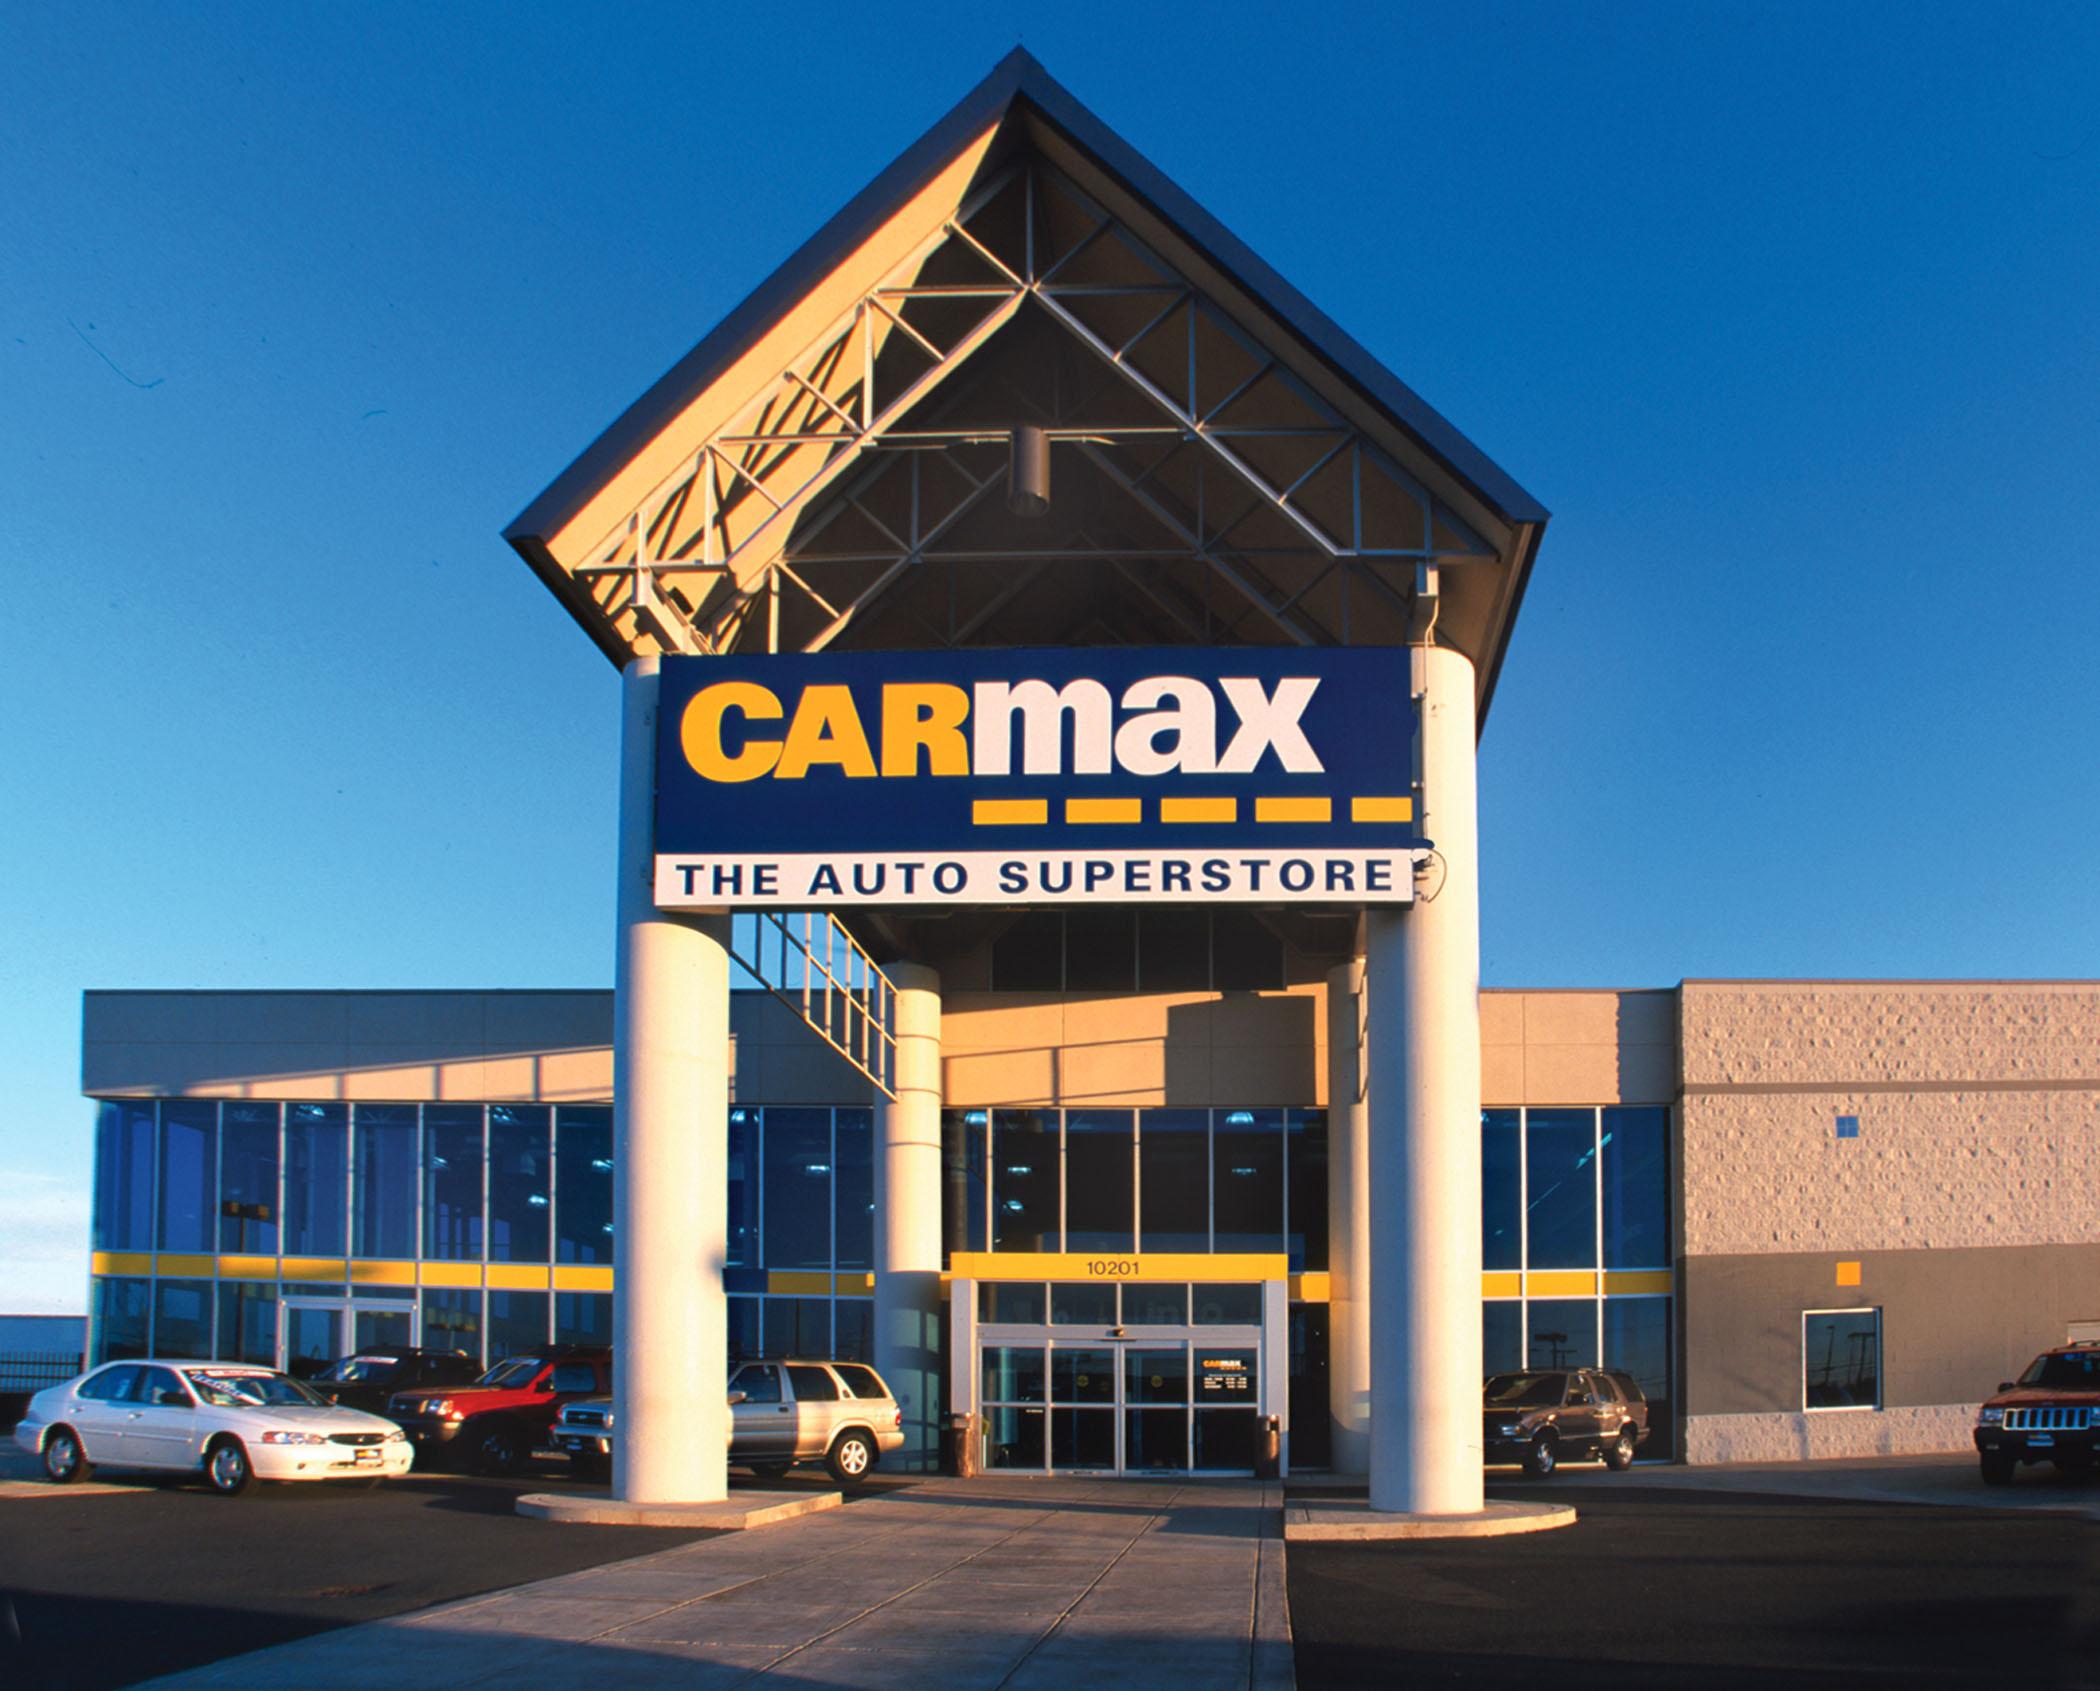 Carmax Sees Used Car Sales Soar The Motley Fool